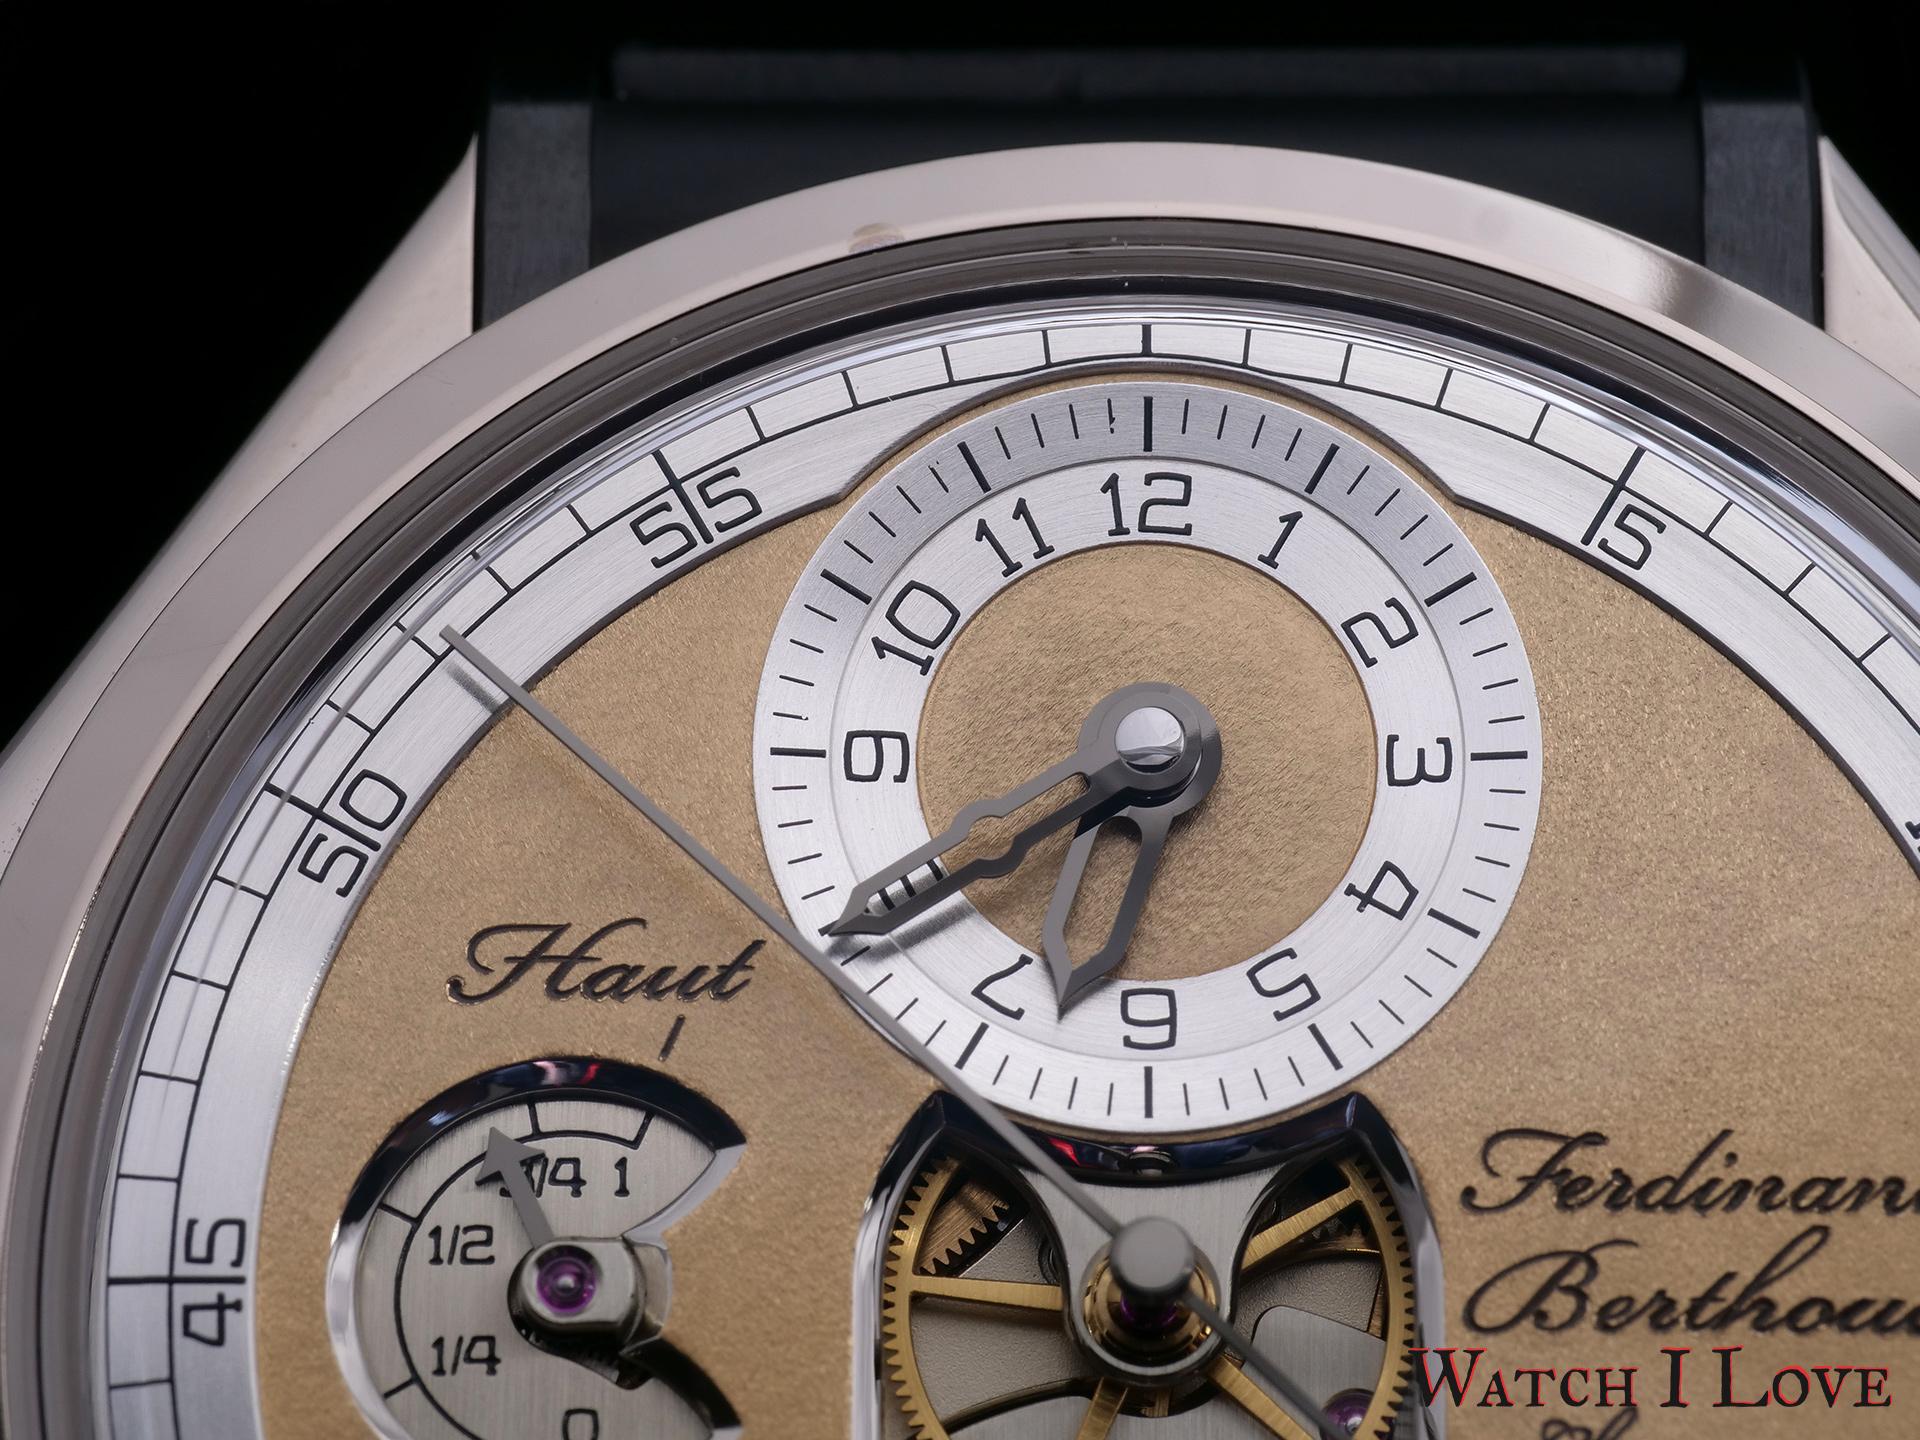 Ferdinand Berthoud Ref. FB 1.1-2 dial